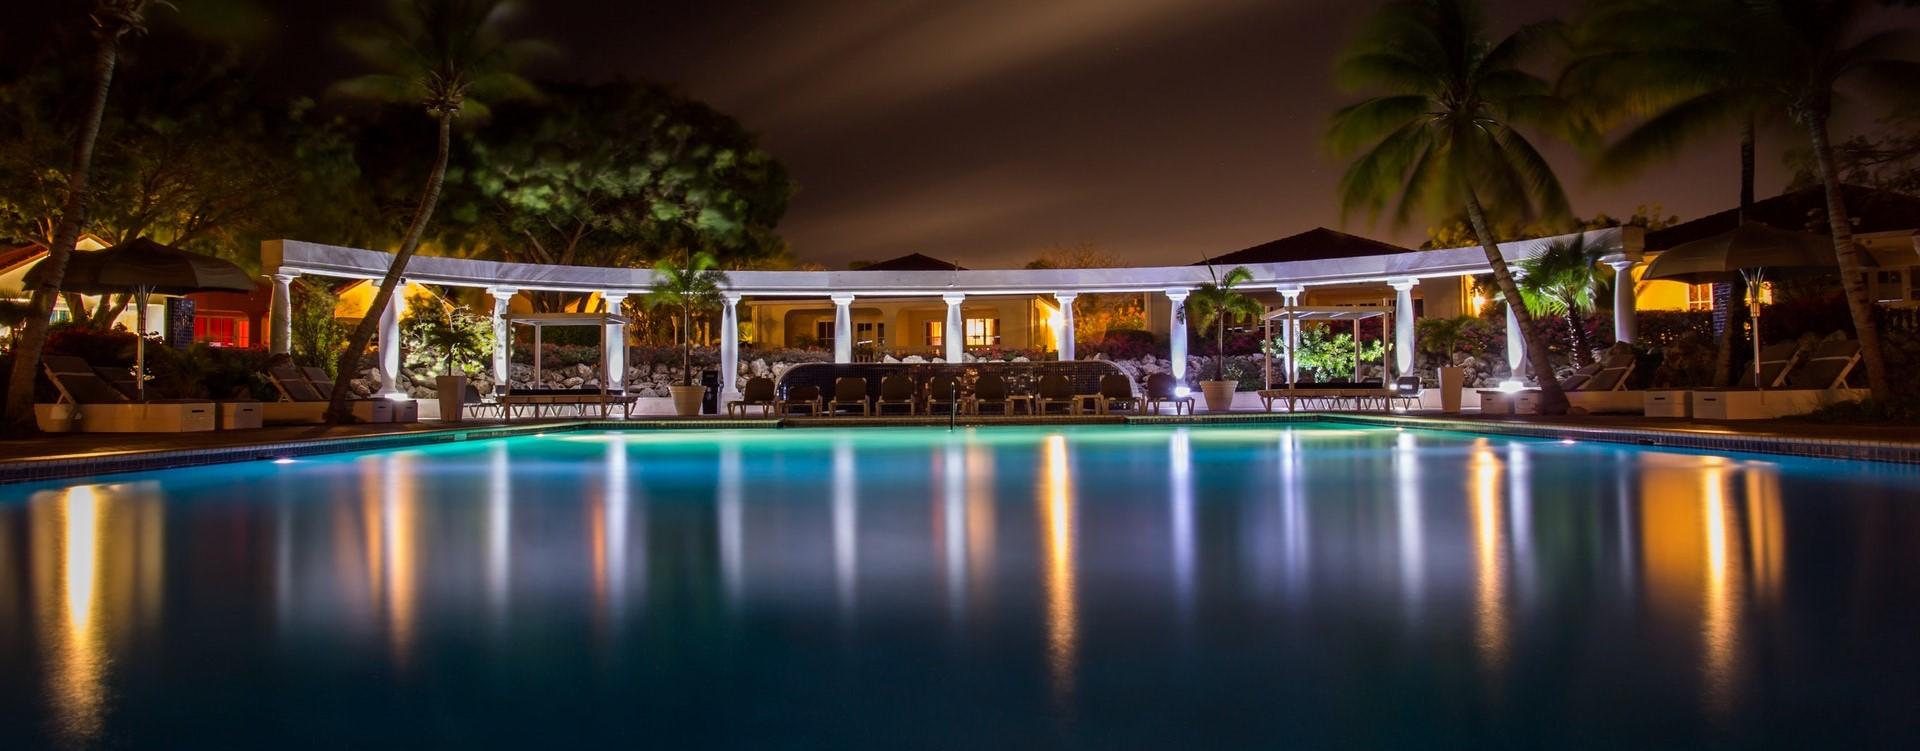 night-dark-hotel-luxury (2)